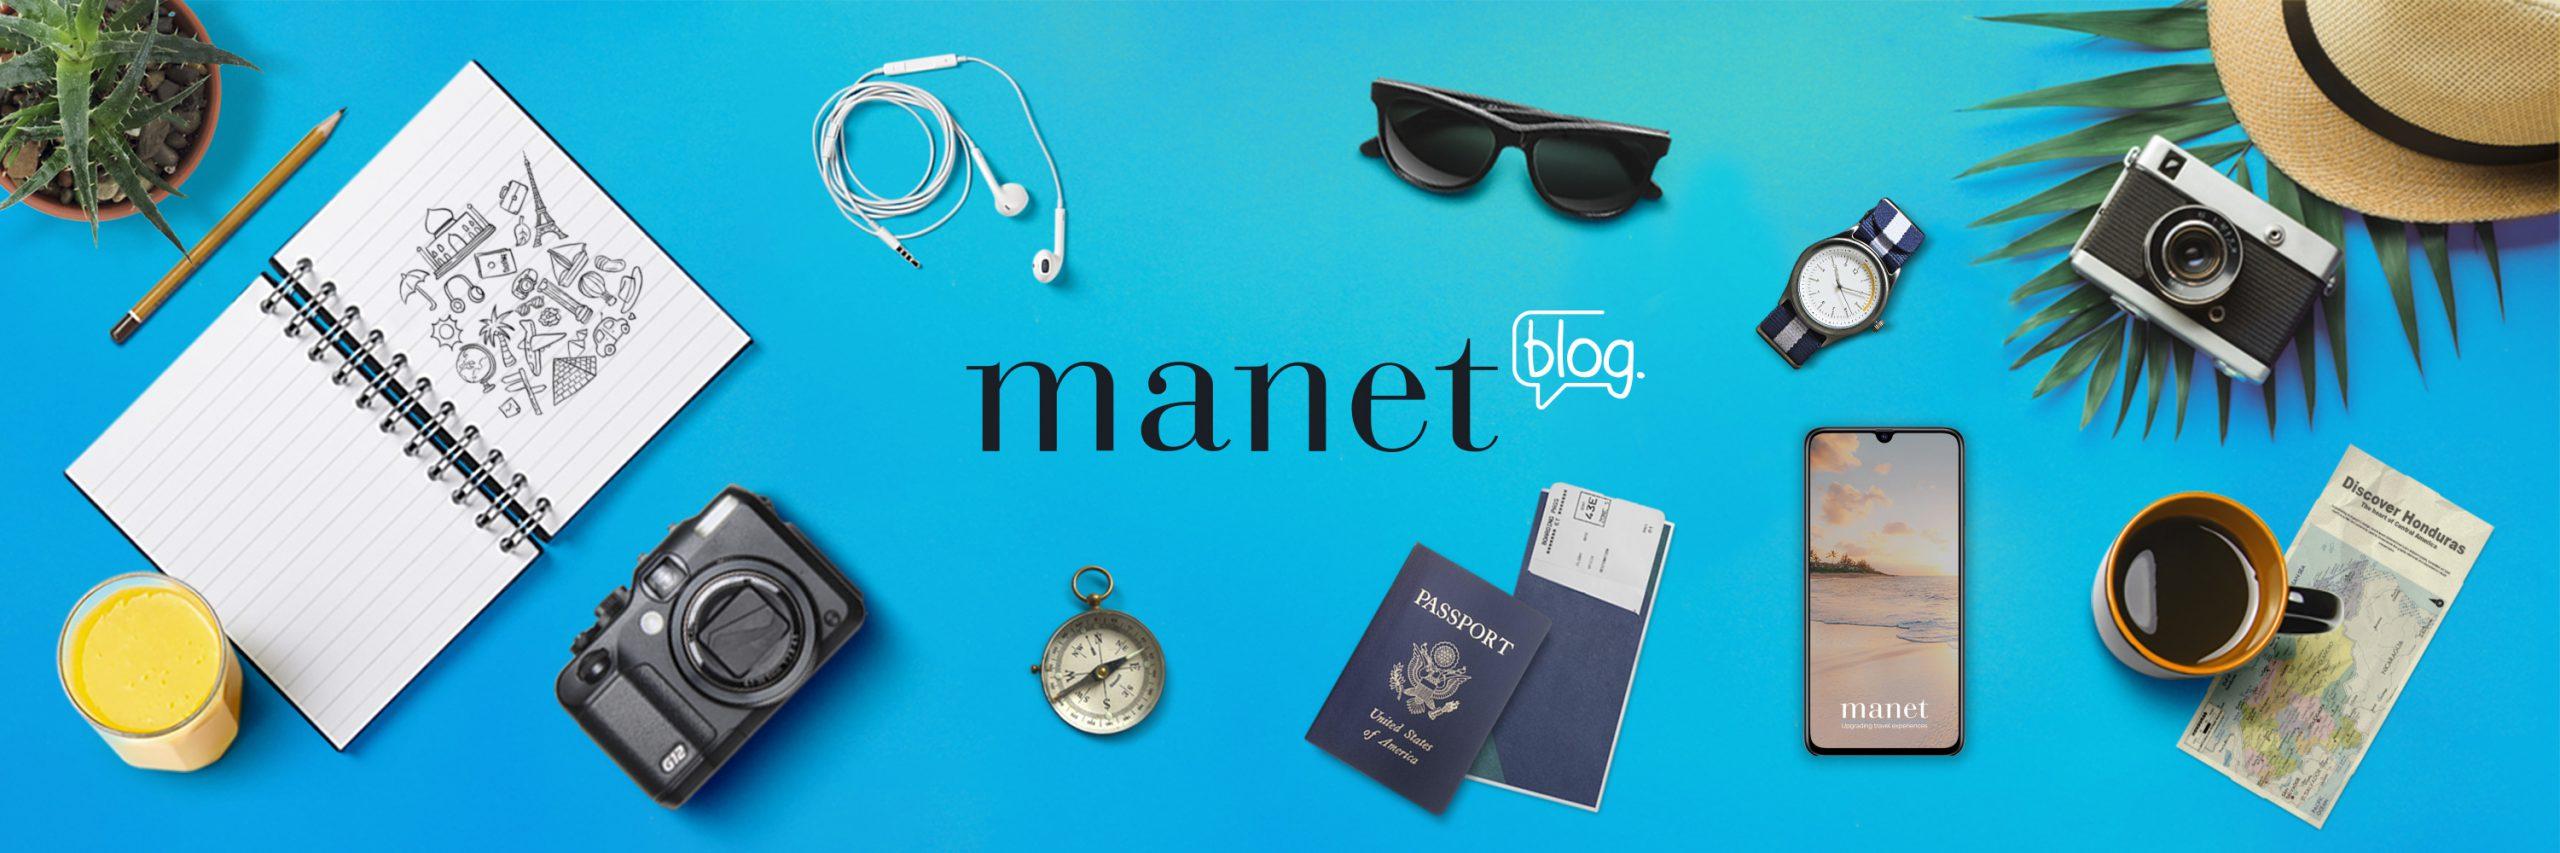 Manet - Travel & Hospitality Blog